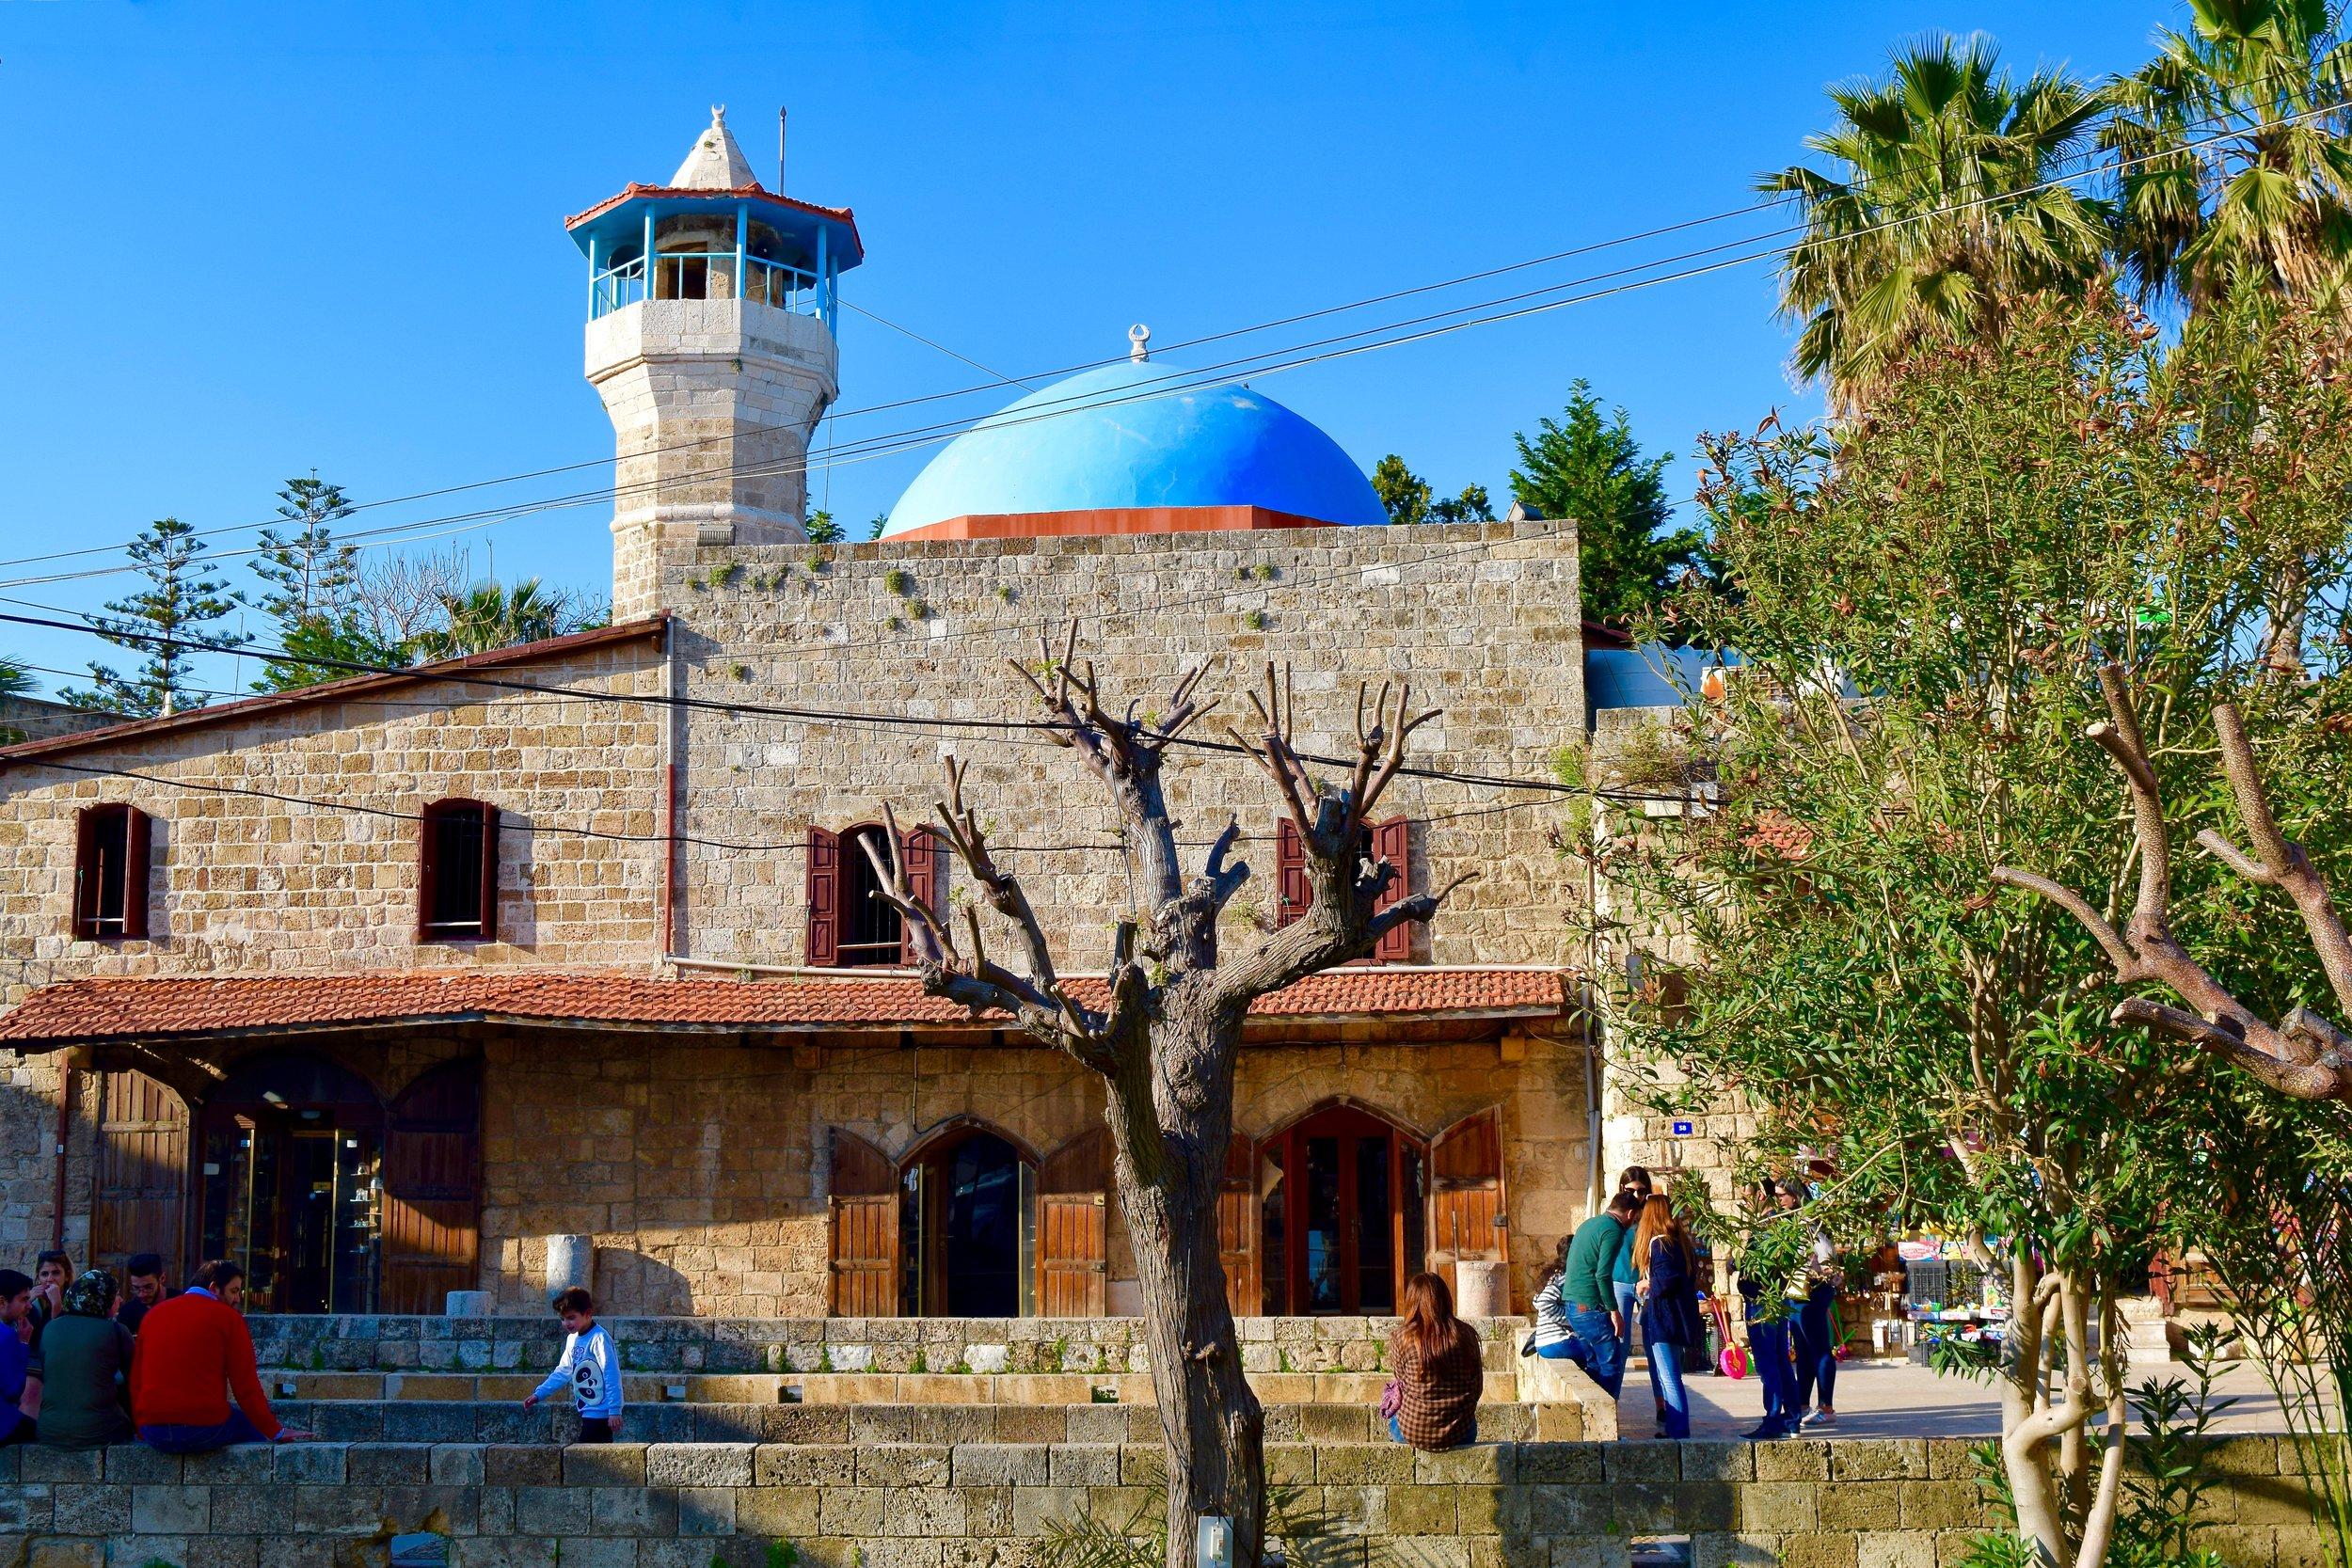 Mosque of the Sultan Abdul Majid